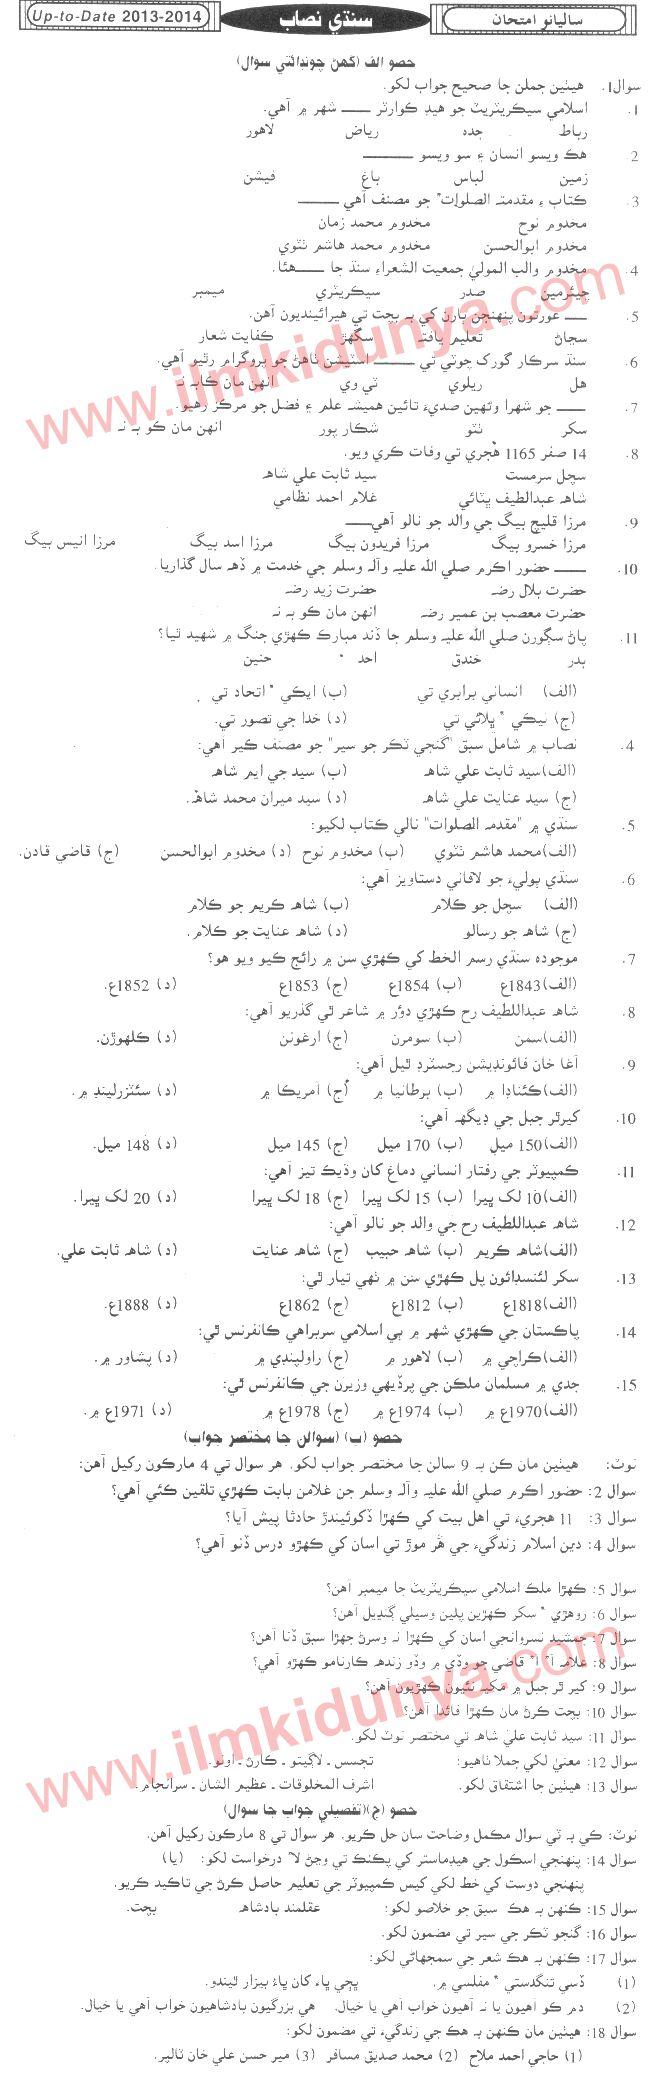 past papers of board of intermediate karachi Biekkarachi model papers 2018 2017 11th, 12th, inter, hssc, fa, fsc, intermediate, inter part 1, inter part 2, 1st year, 2nd year: biek karachi board latest model.